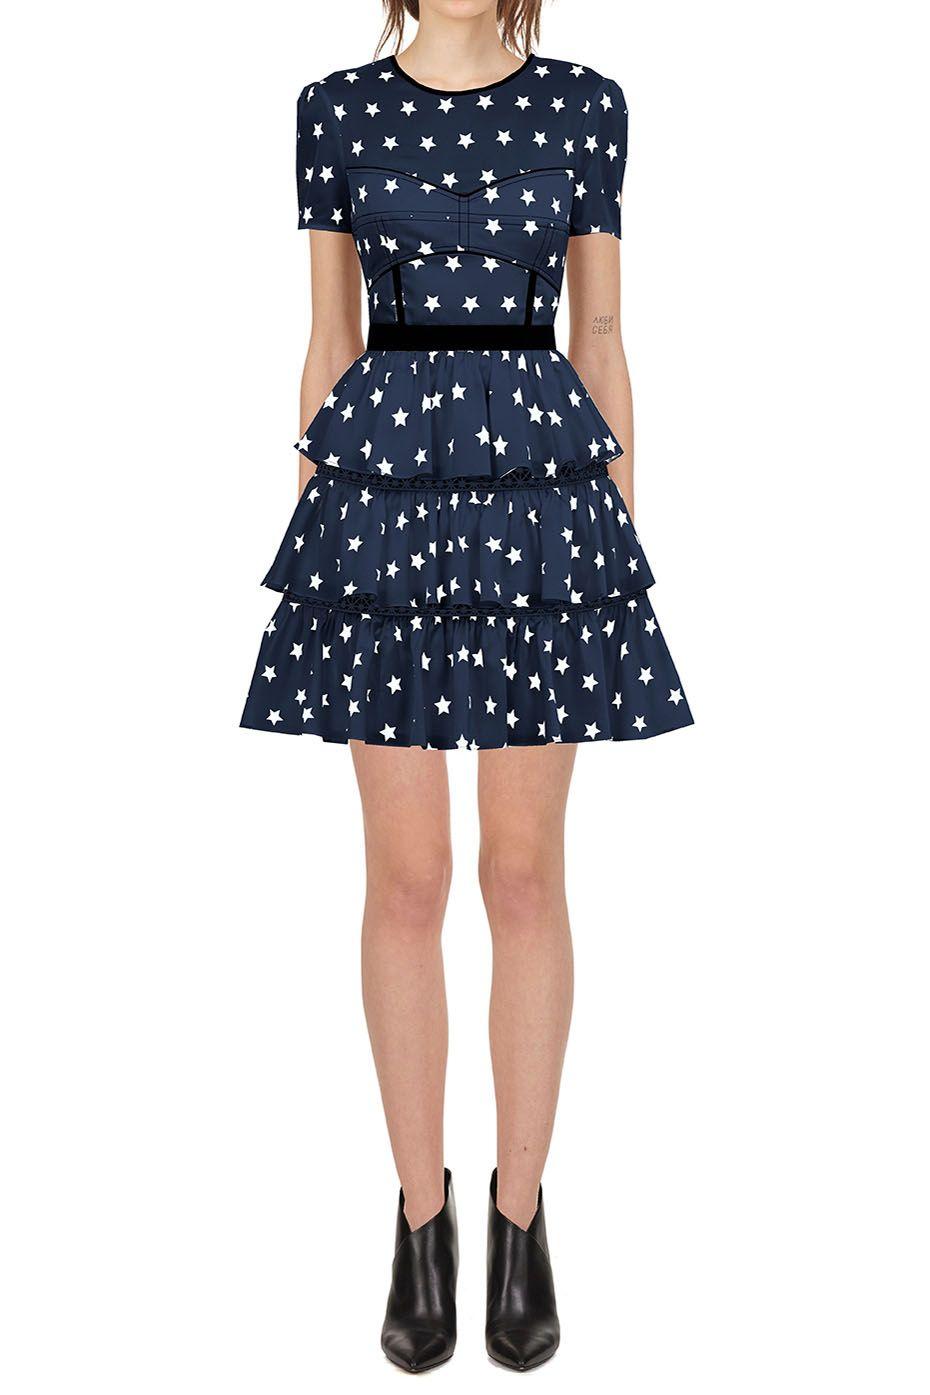 a6c89a93d8d Self Portrait Satin Star Printed Tiered Dress